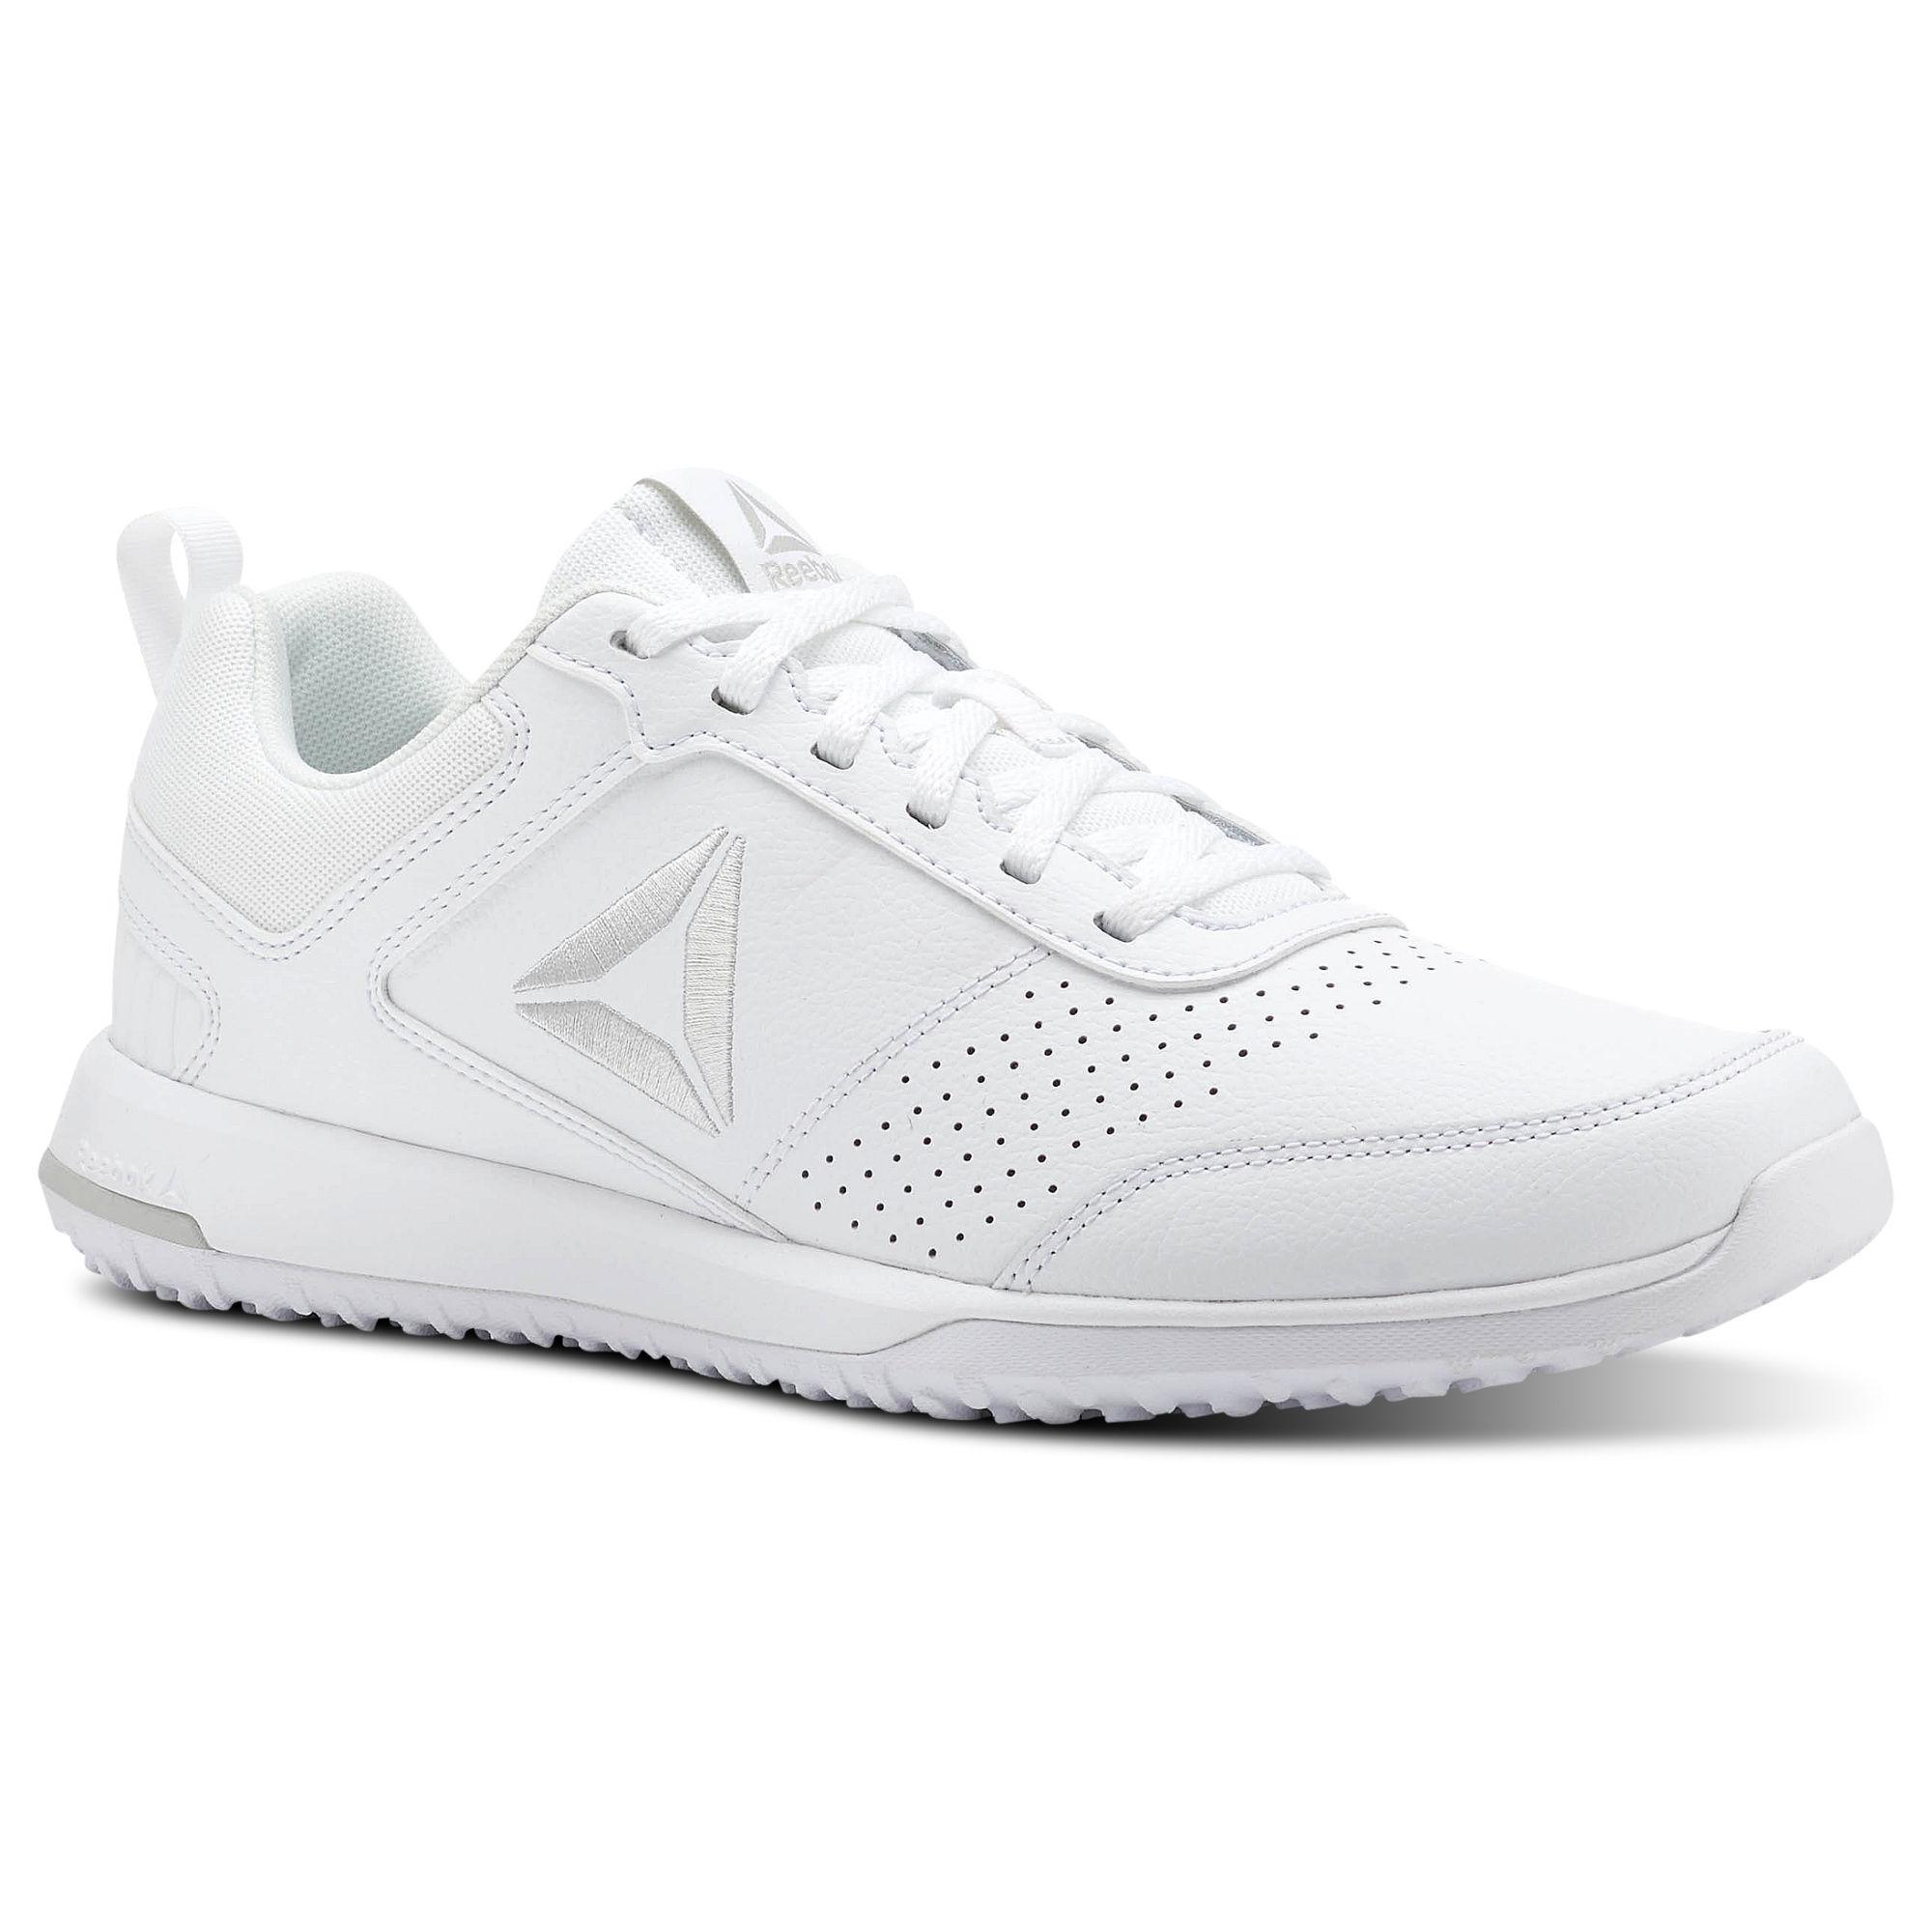 6527dea39a1 Reebok Men s CXT Training Shoe  29.99 + Free S H - Slickdeals.net